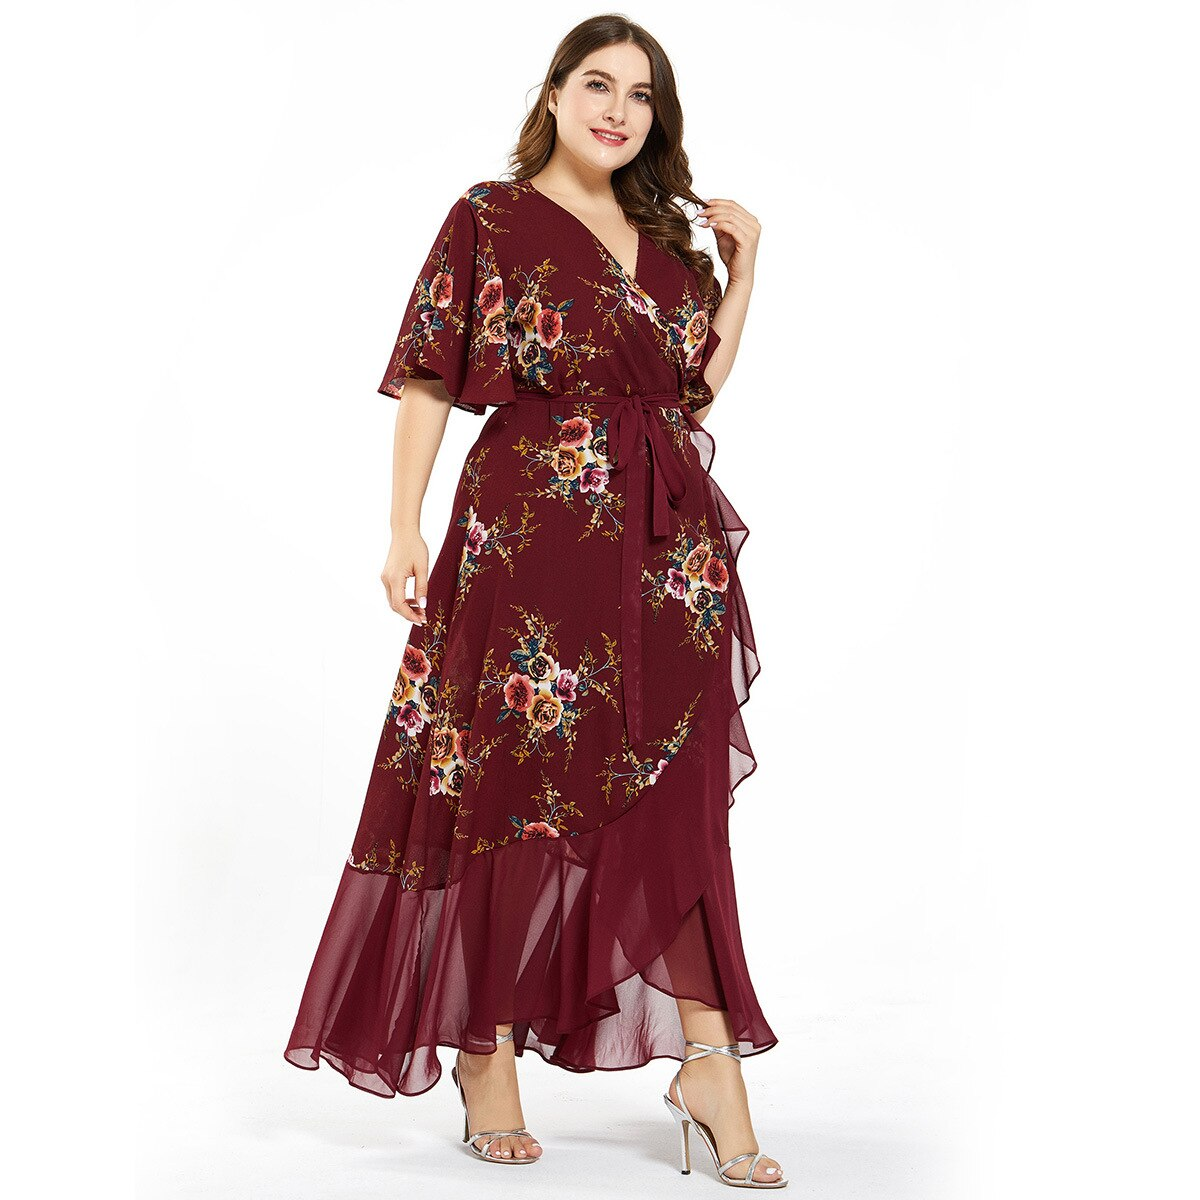 Women Summer Dress Plus Size 4XL 5XL Female V Neck Short Sleeve Floral Print Ruffles Boho Beach Dress Maxi Long Wrap Dresses